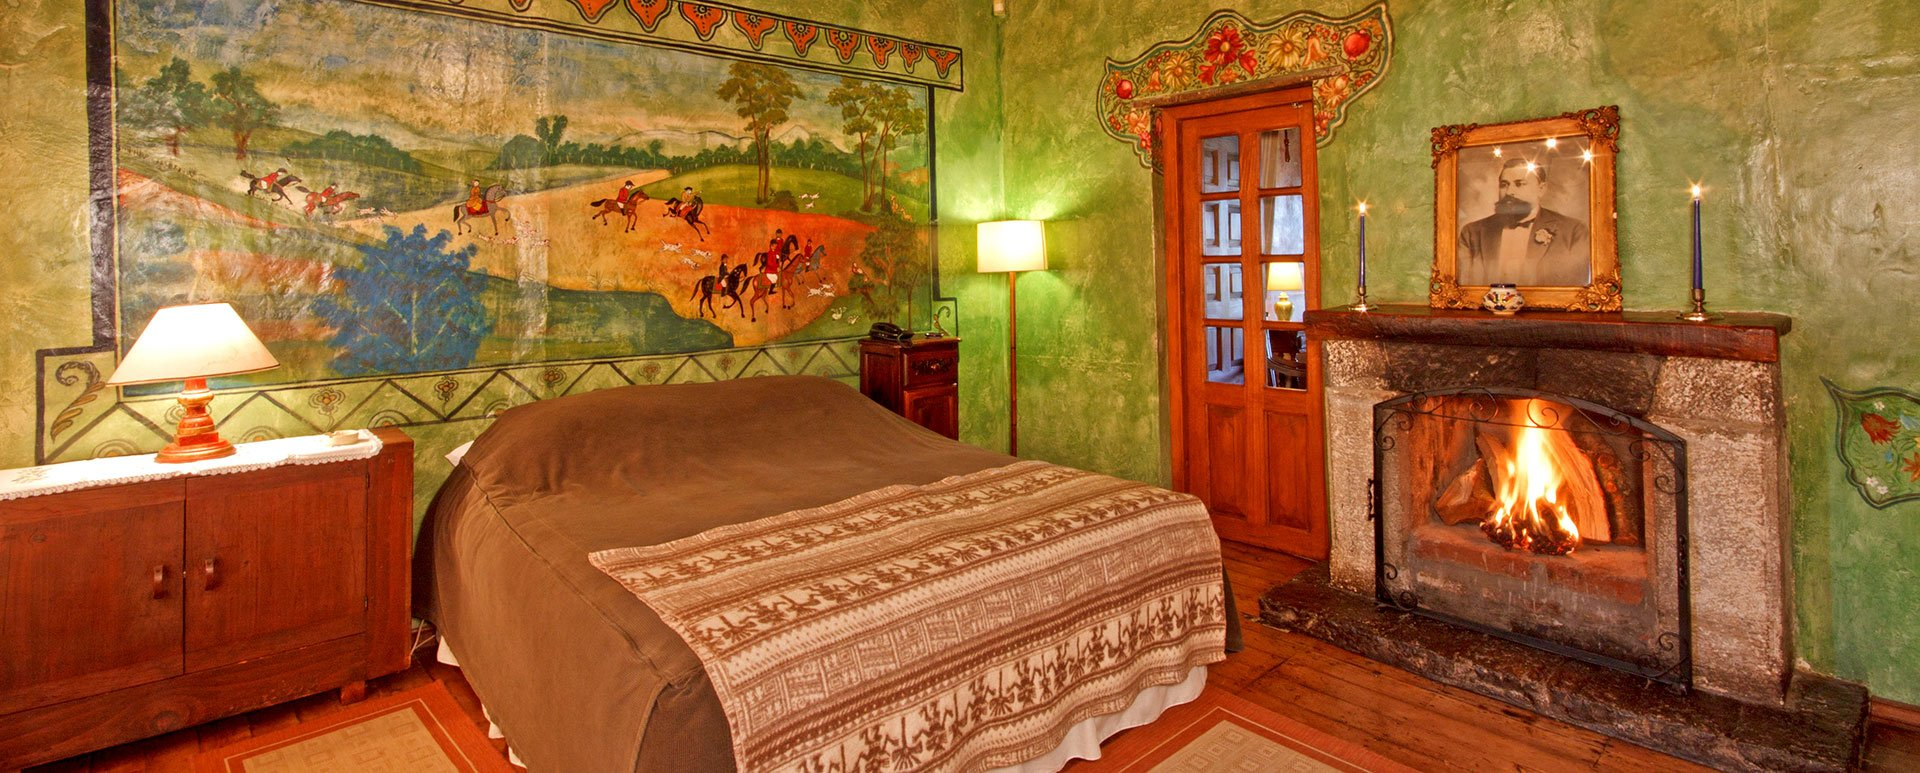 Hacienda San Agustin de Callo room